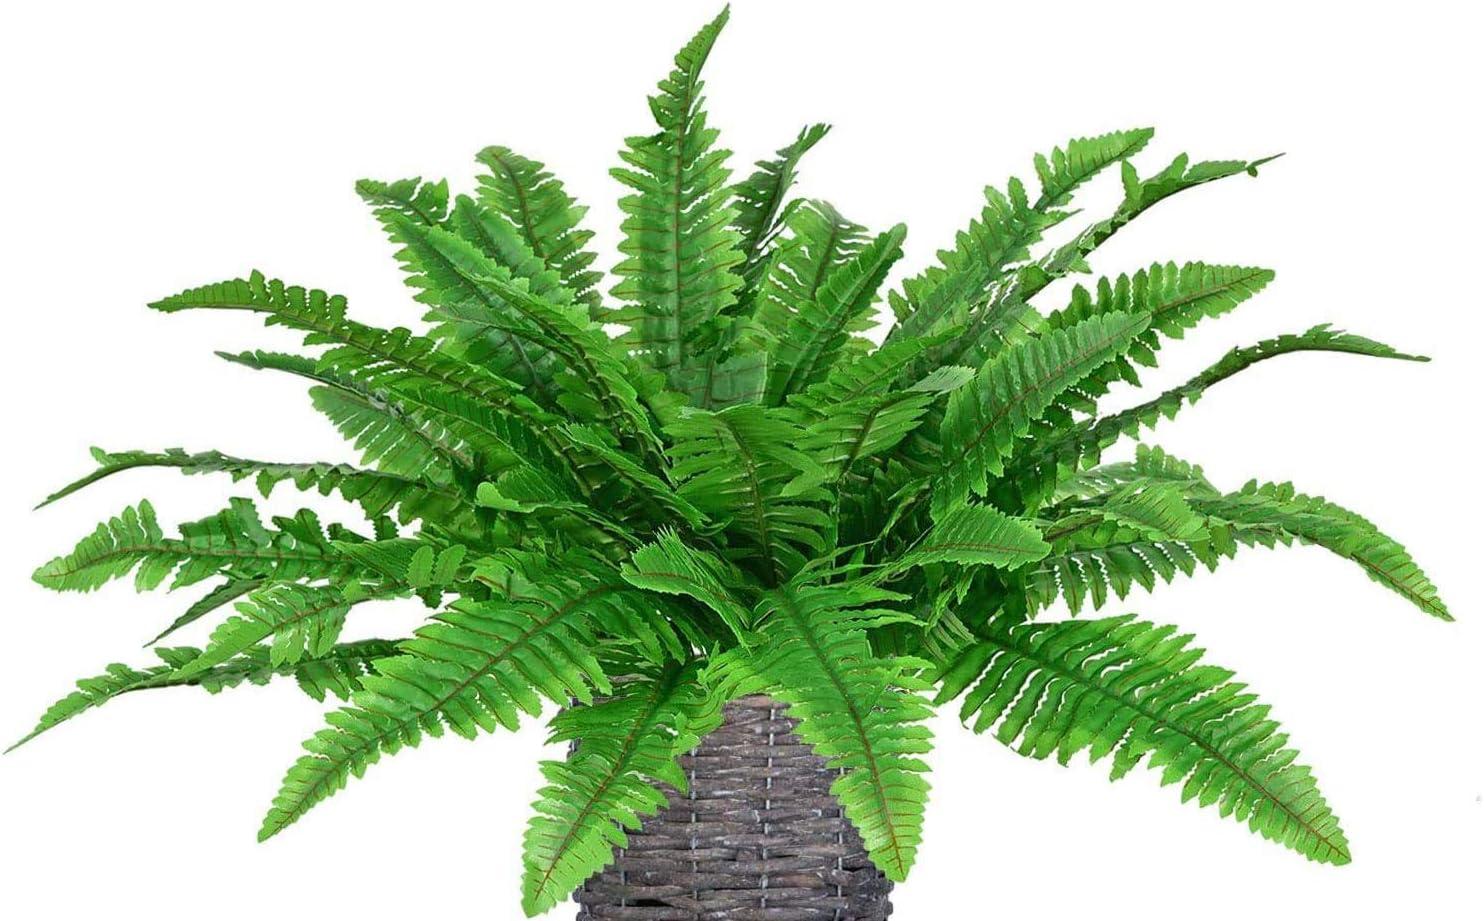 Large Artificial Boston Fern Leaf Fake Plant Bush Leave Foliage Outdoor Decor